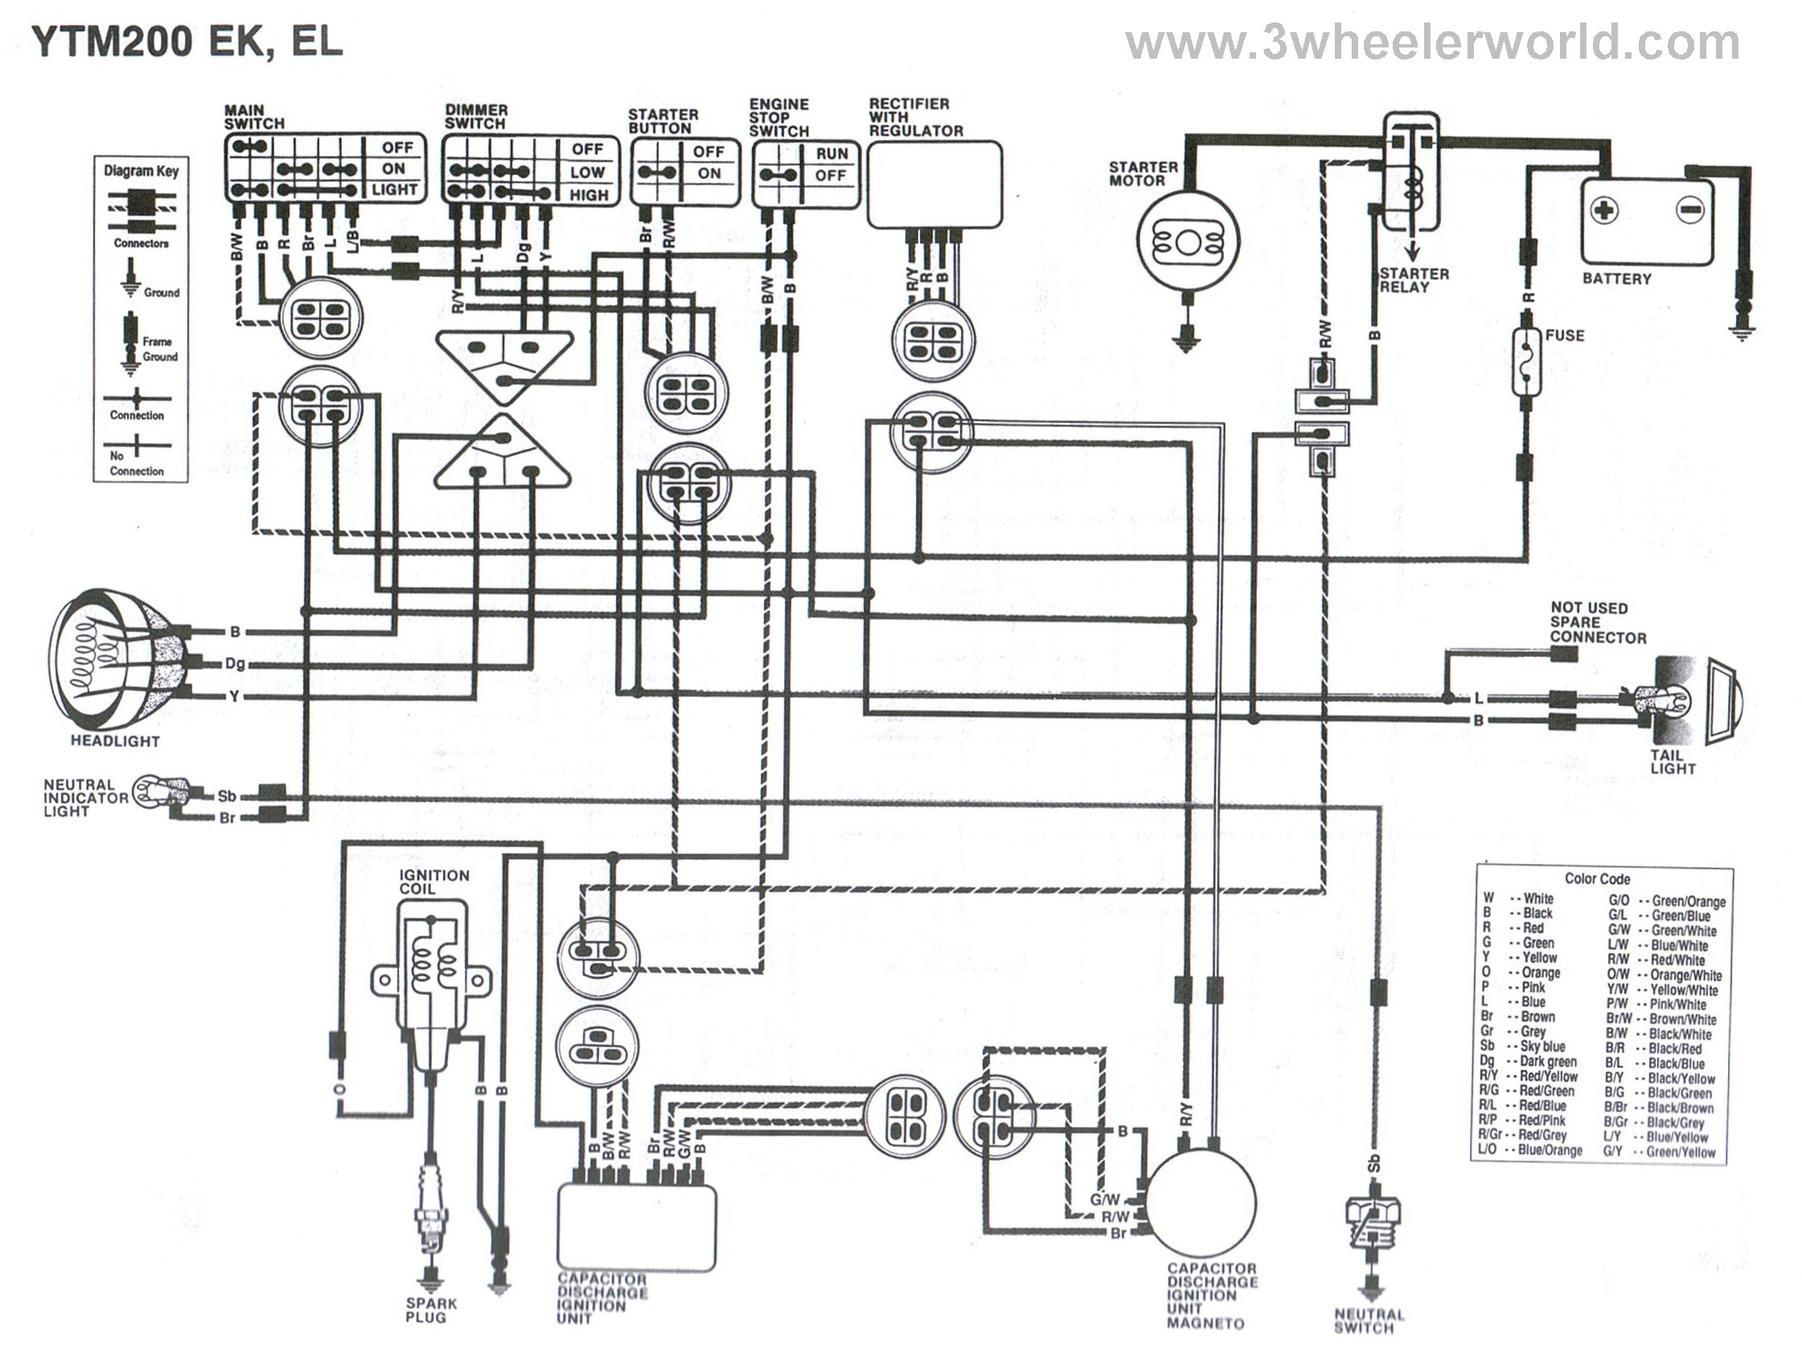 Yamaha razz cdi scooter invasion readingrat 1987 yamaha virago 535 wiring diagram wiring diagram wiring diagram sciox Choice Image